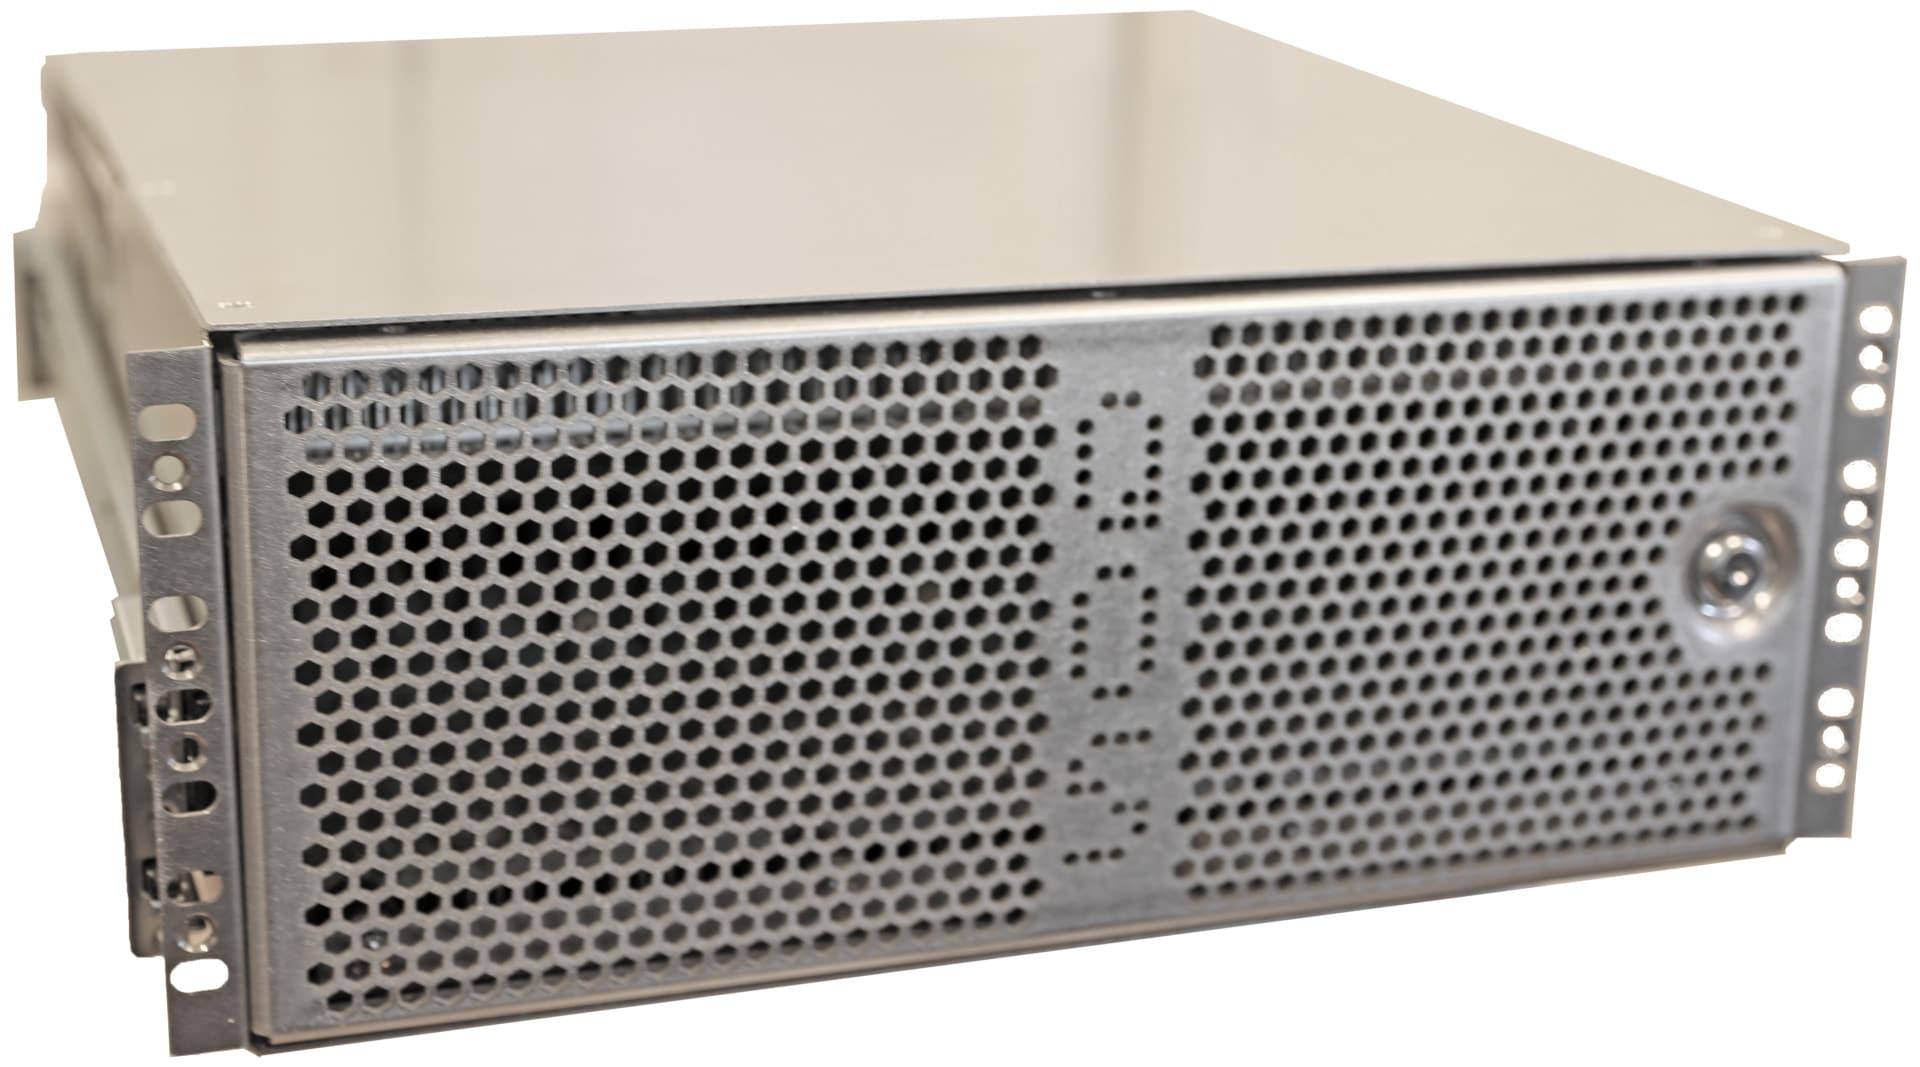 QOS Server - Rack Mount ADDIT